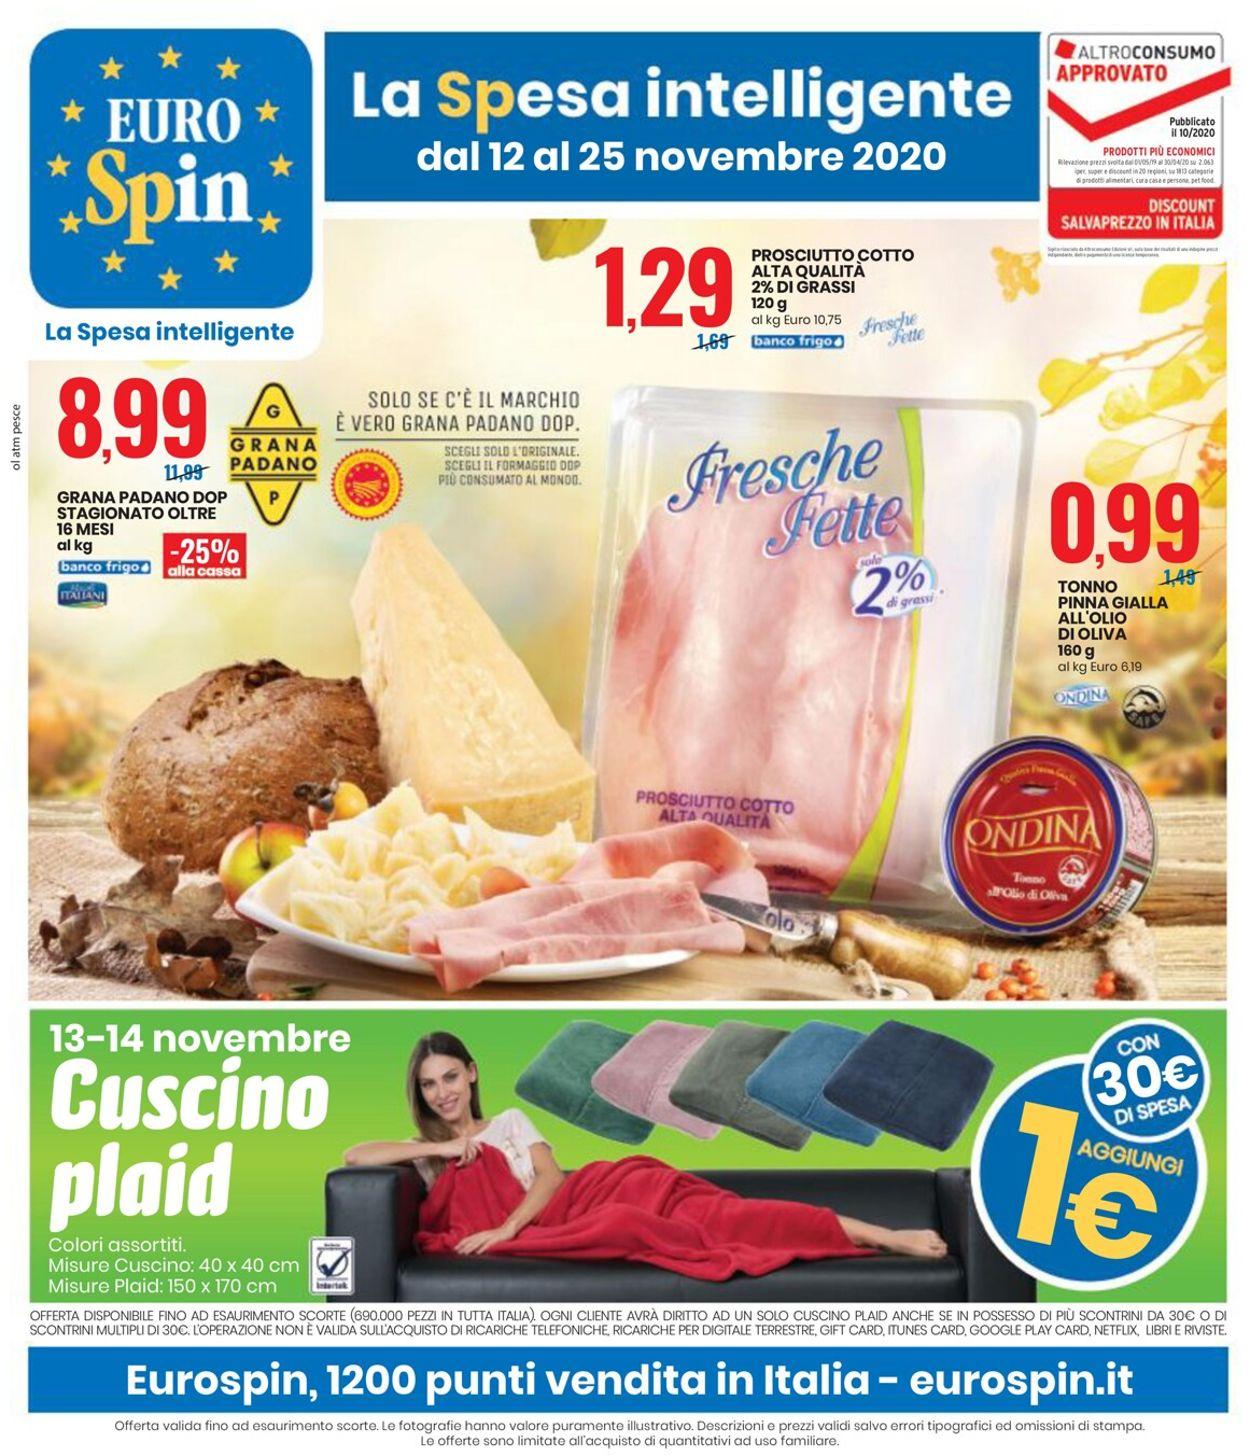 Volantino EURO Spin - Offerte 12/11-25/11/2020